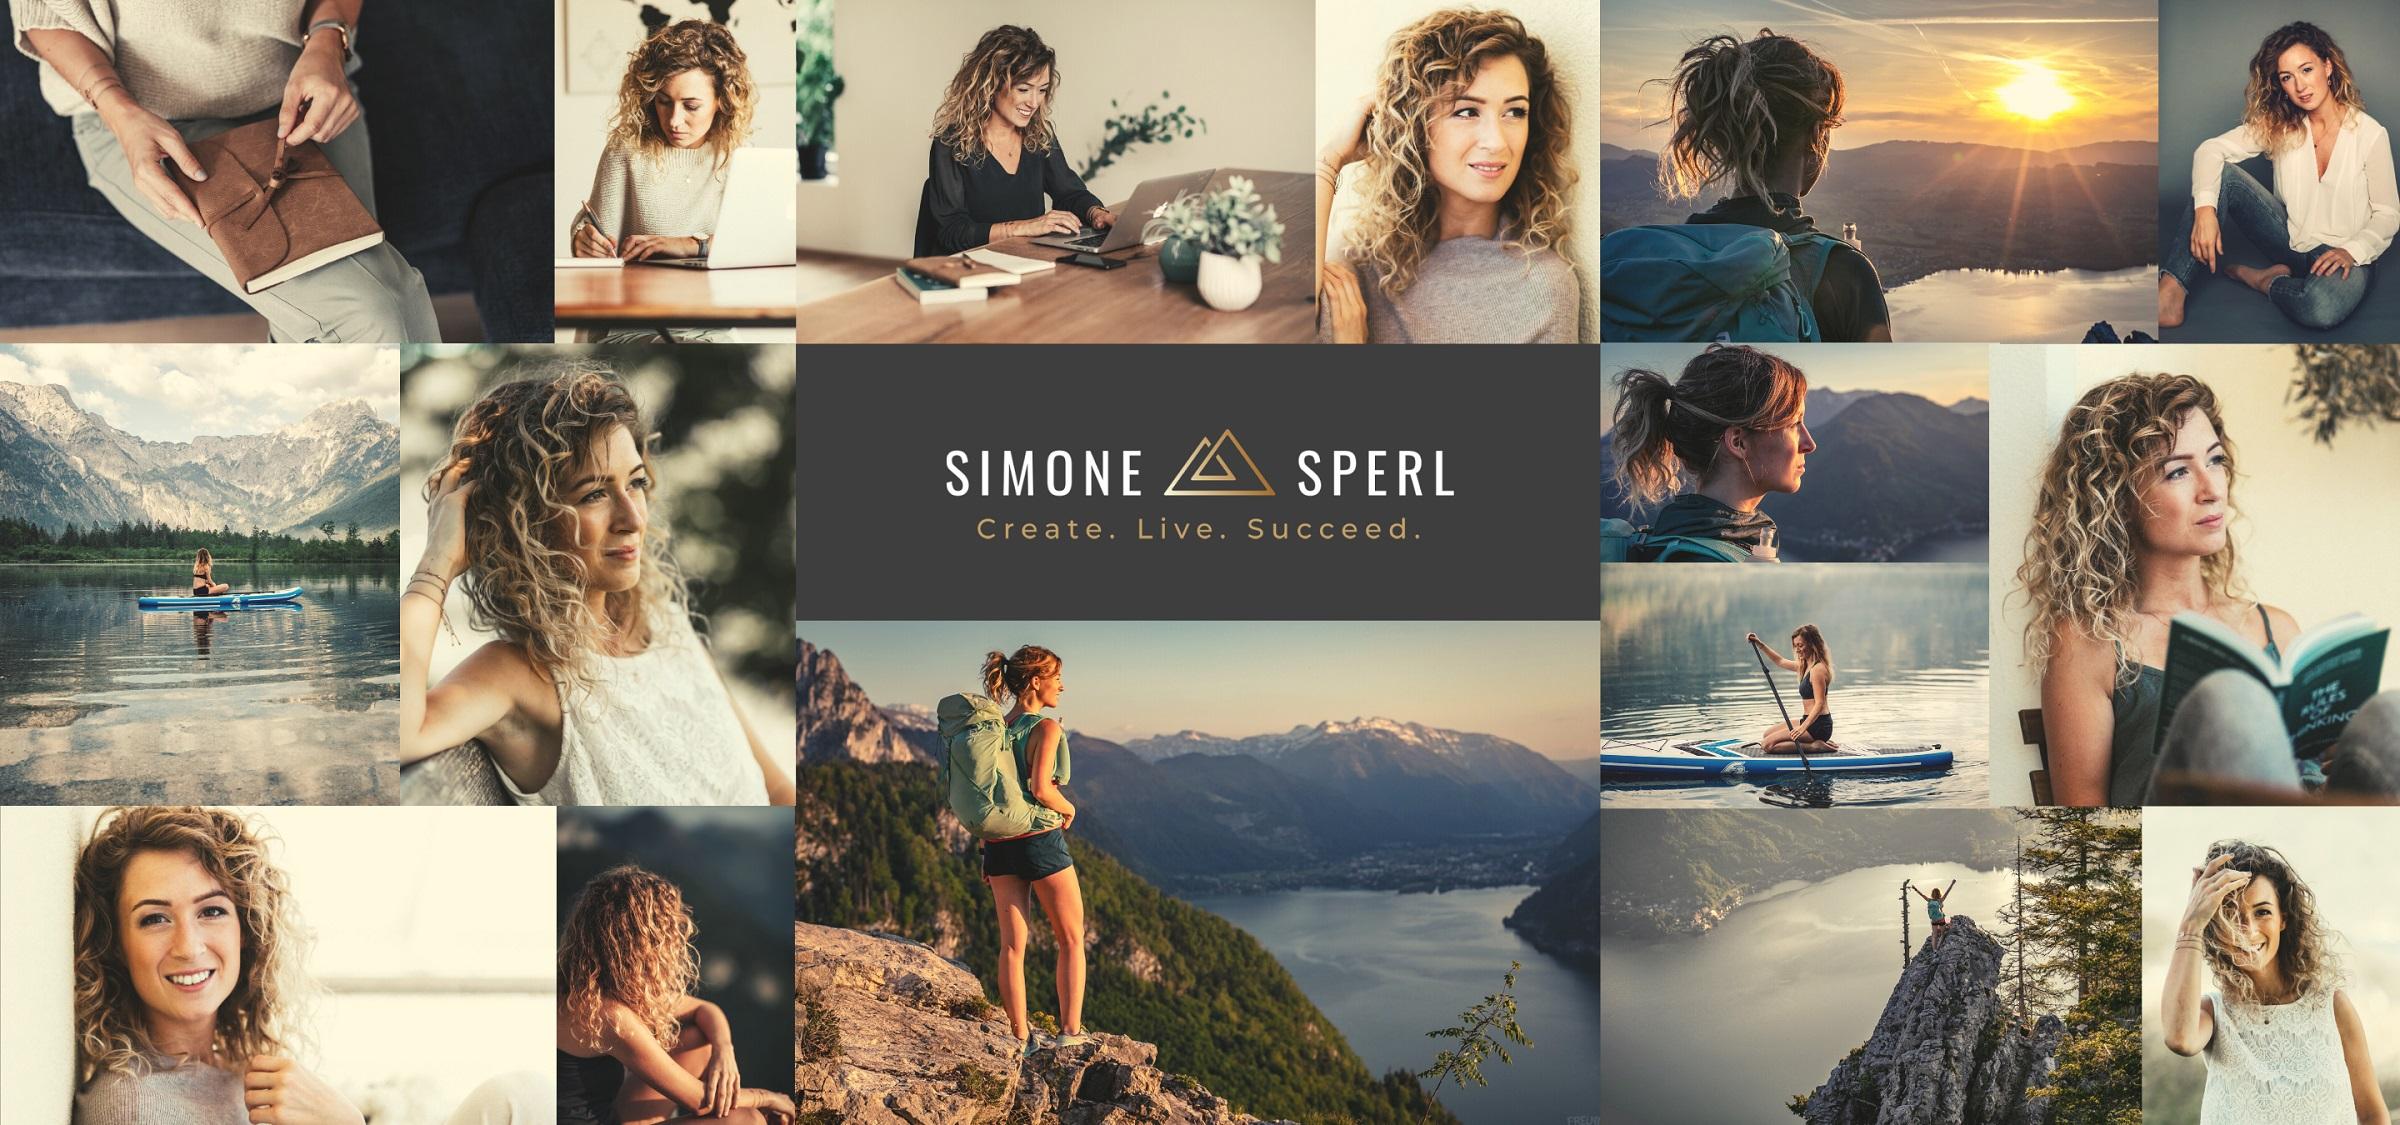 Simone Sperl